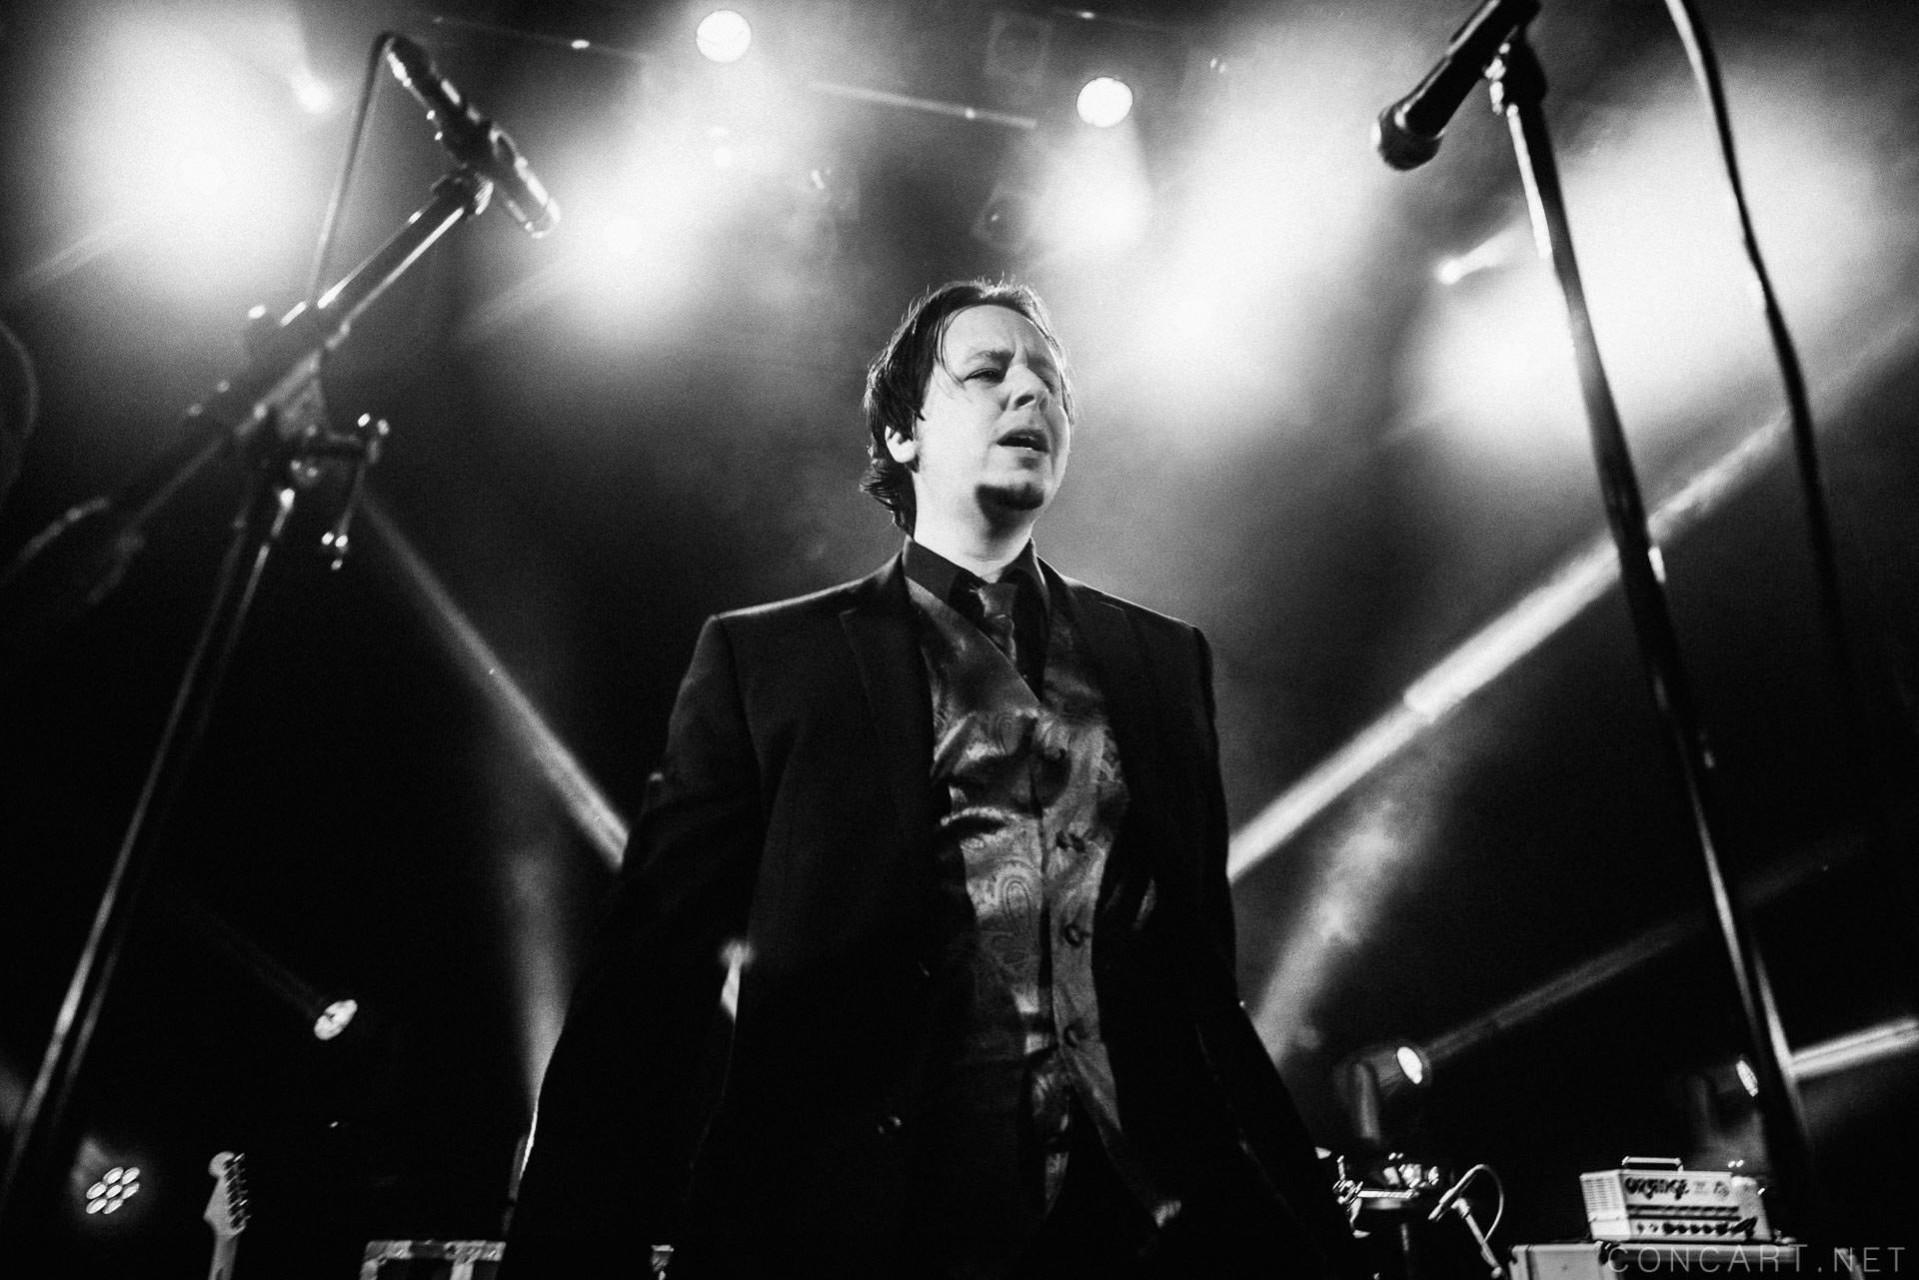 Audiodacity photo by Sean Molin 16